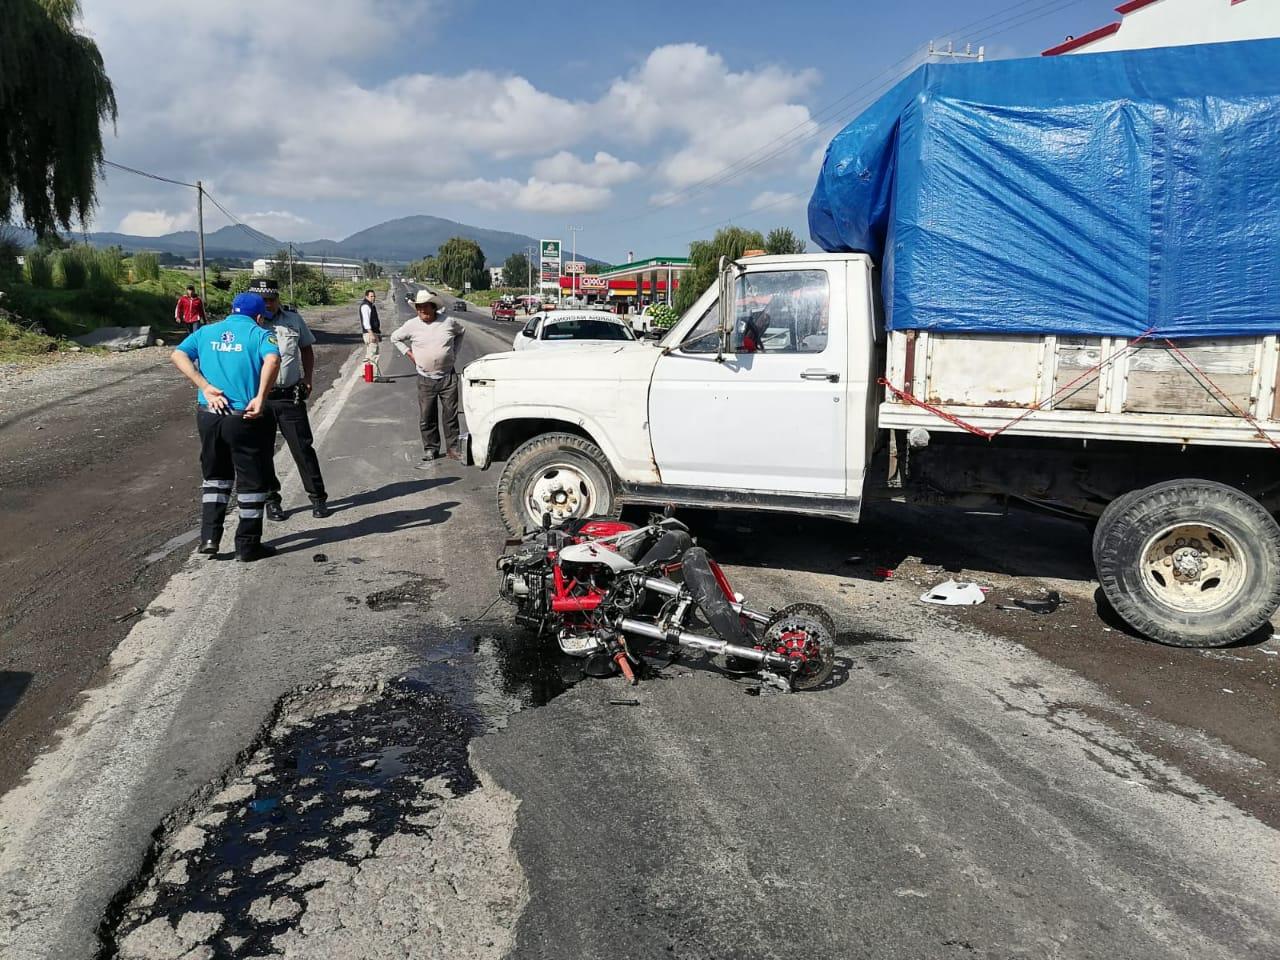 Muere motociclista al ser arrollado en Zinacantepec; el responsable se dio a la fuga